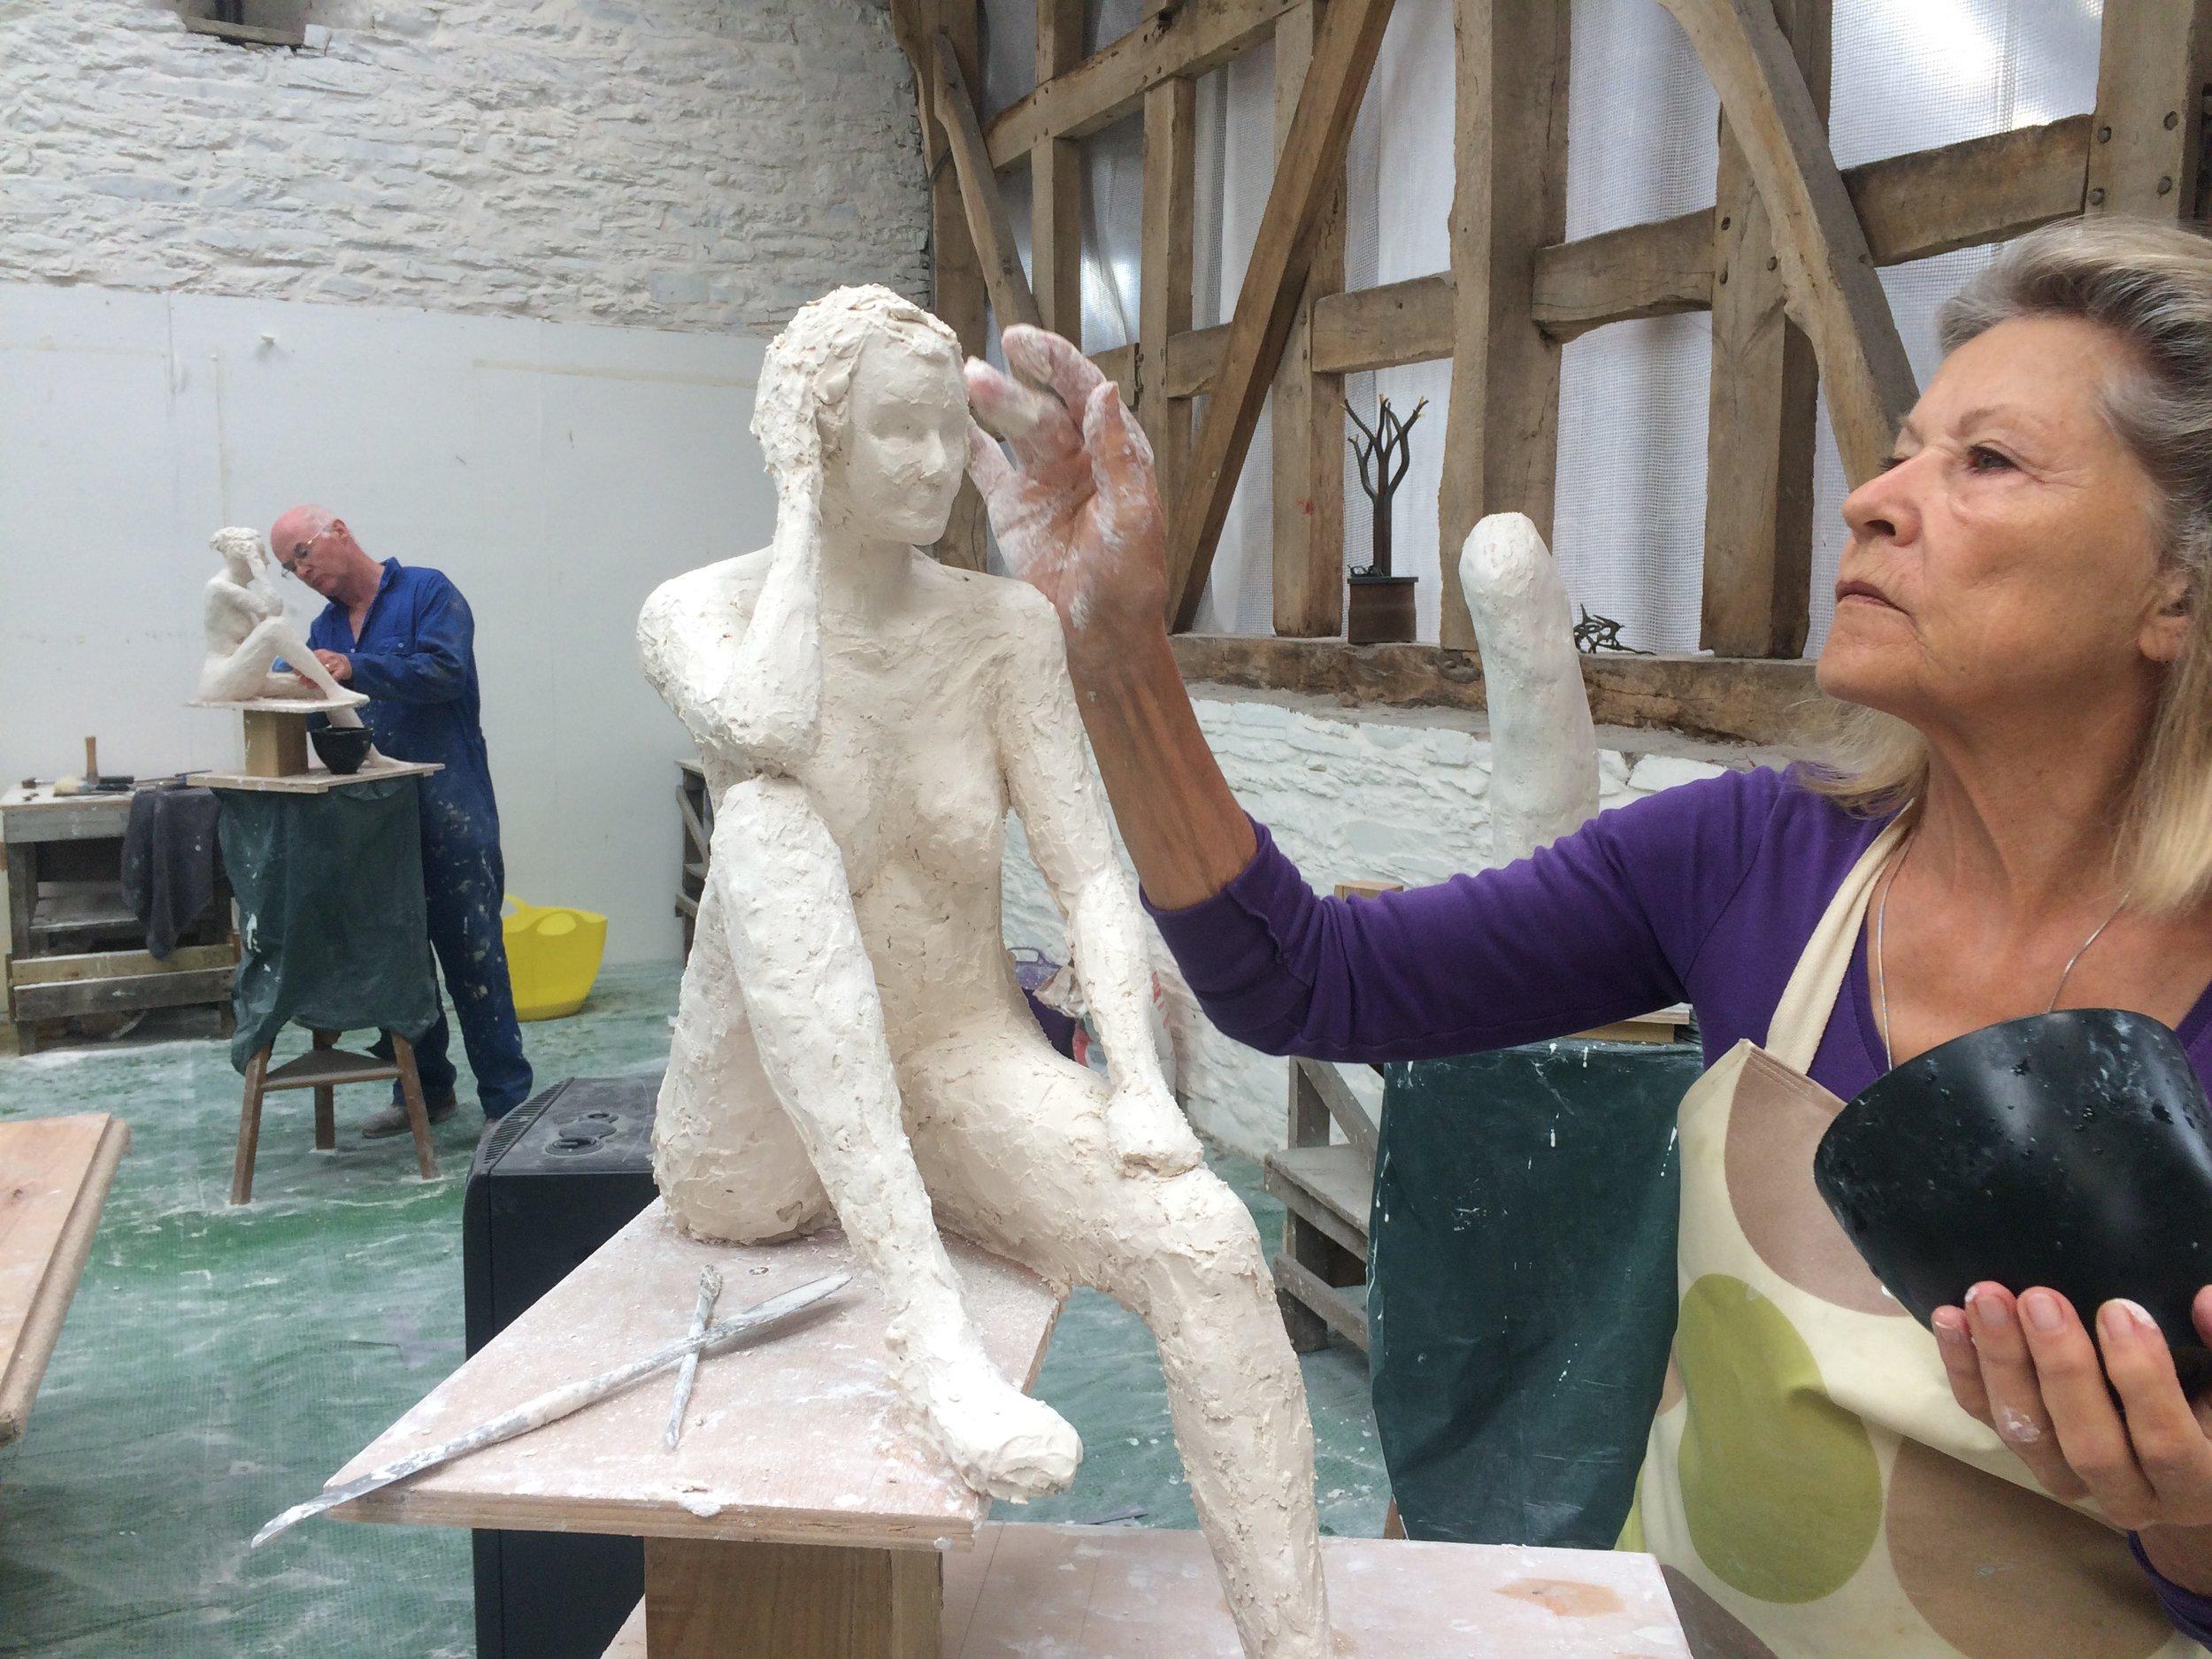 sculpting the figure in plaster